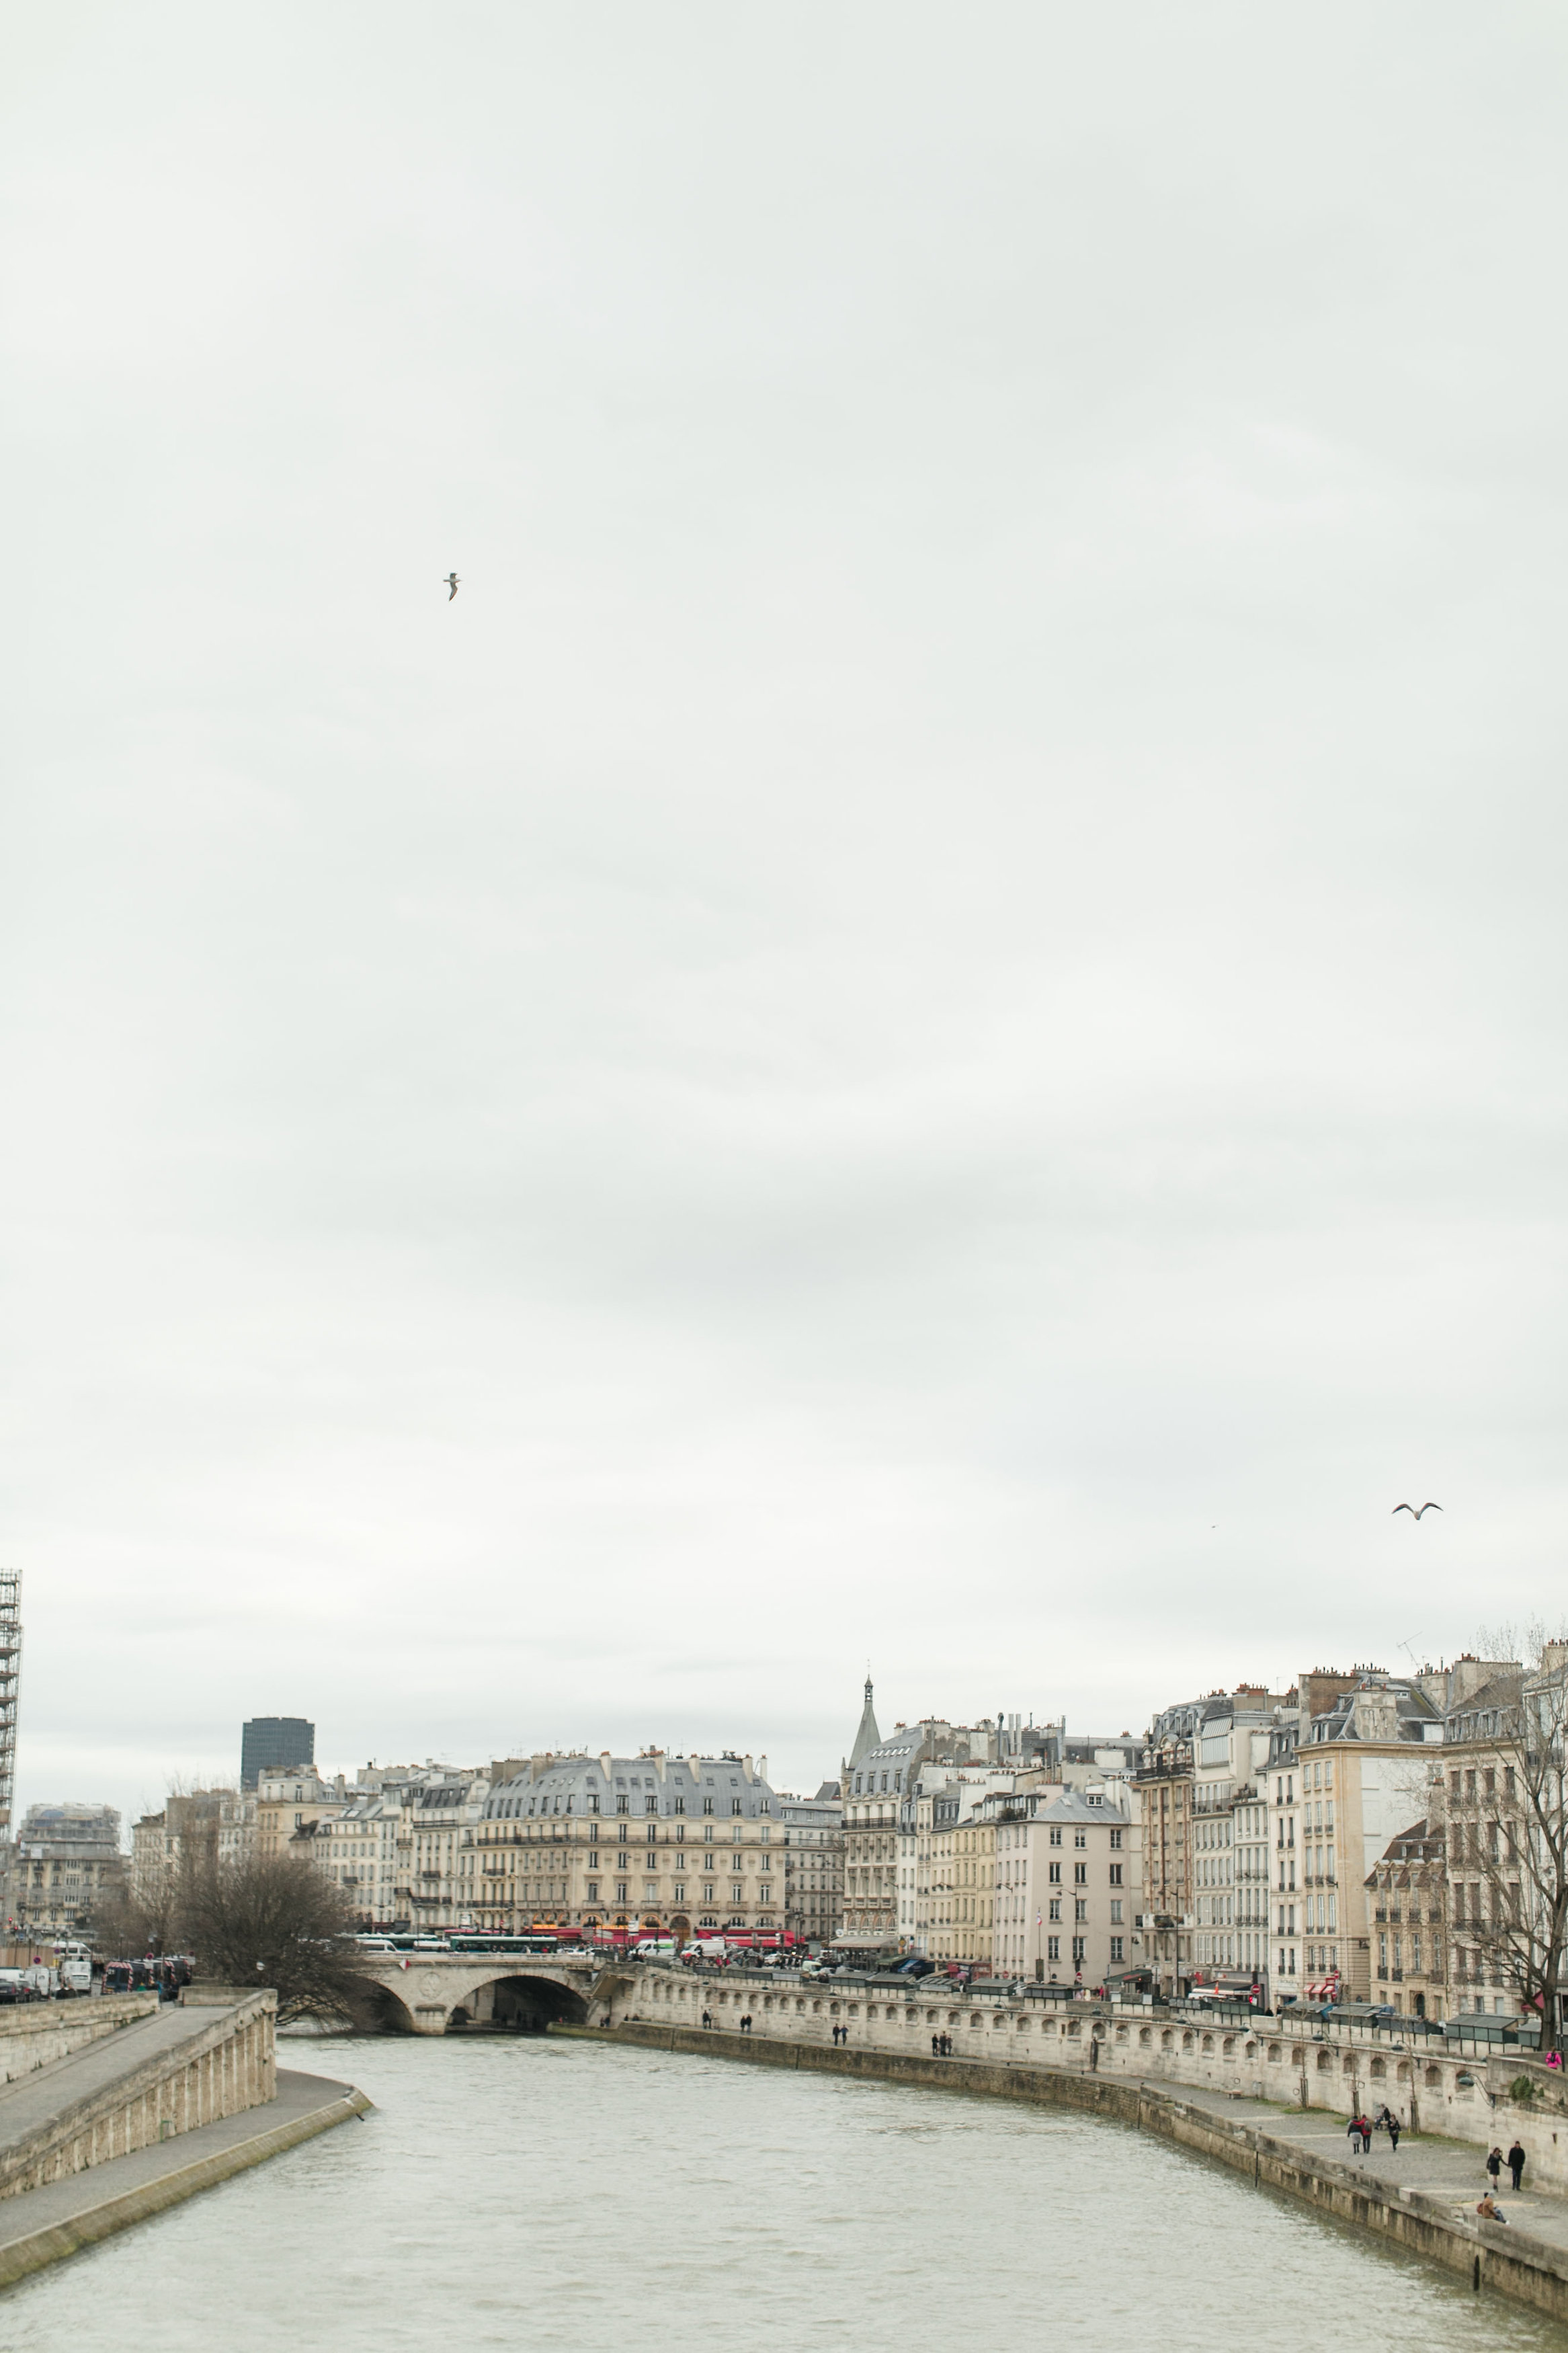 toronto-wedding-photographer-richelle-hunter-photography-new-york-paris-france-inspiration-183.jpg